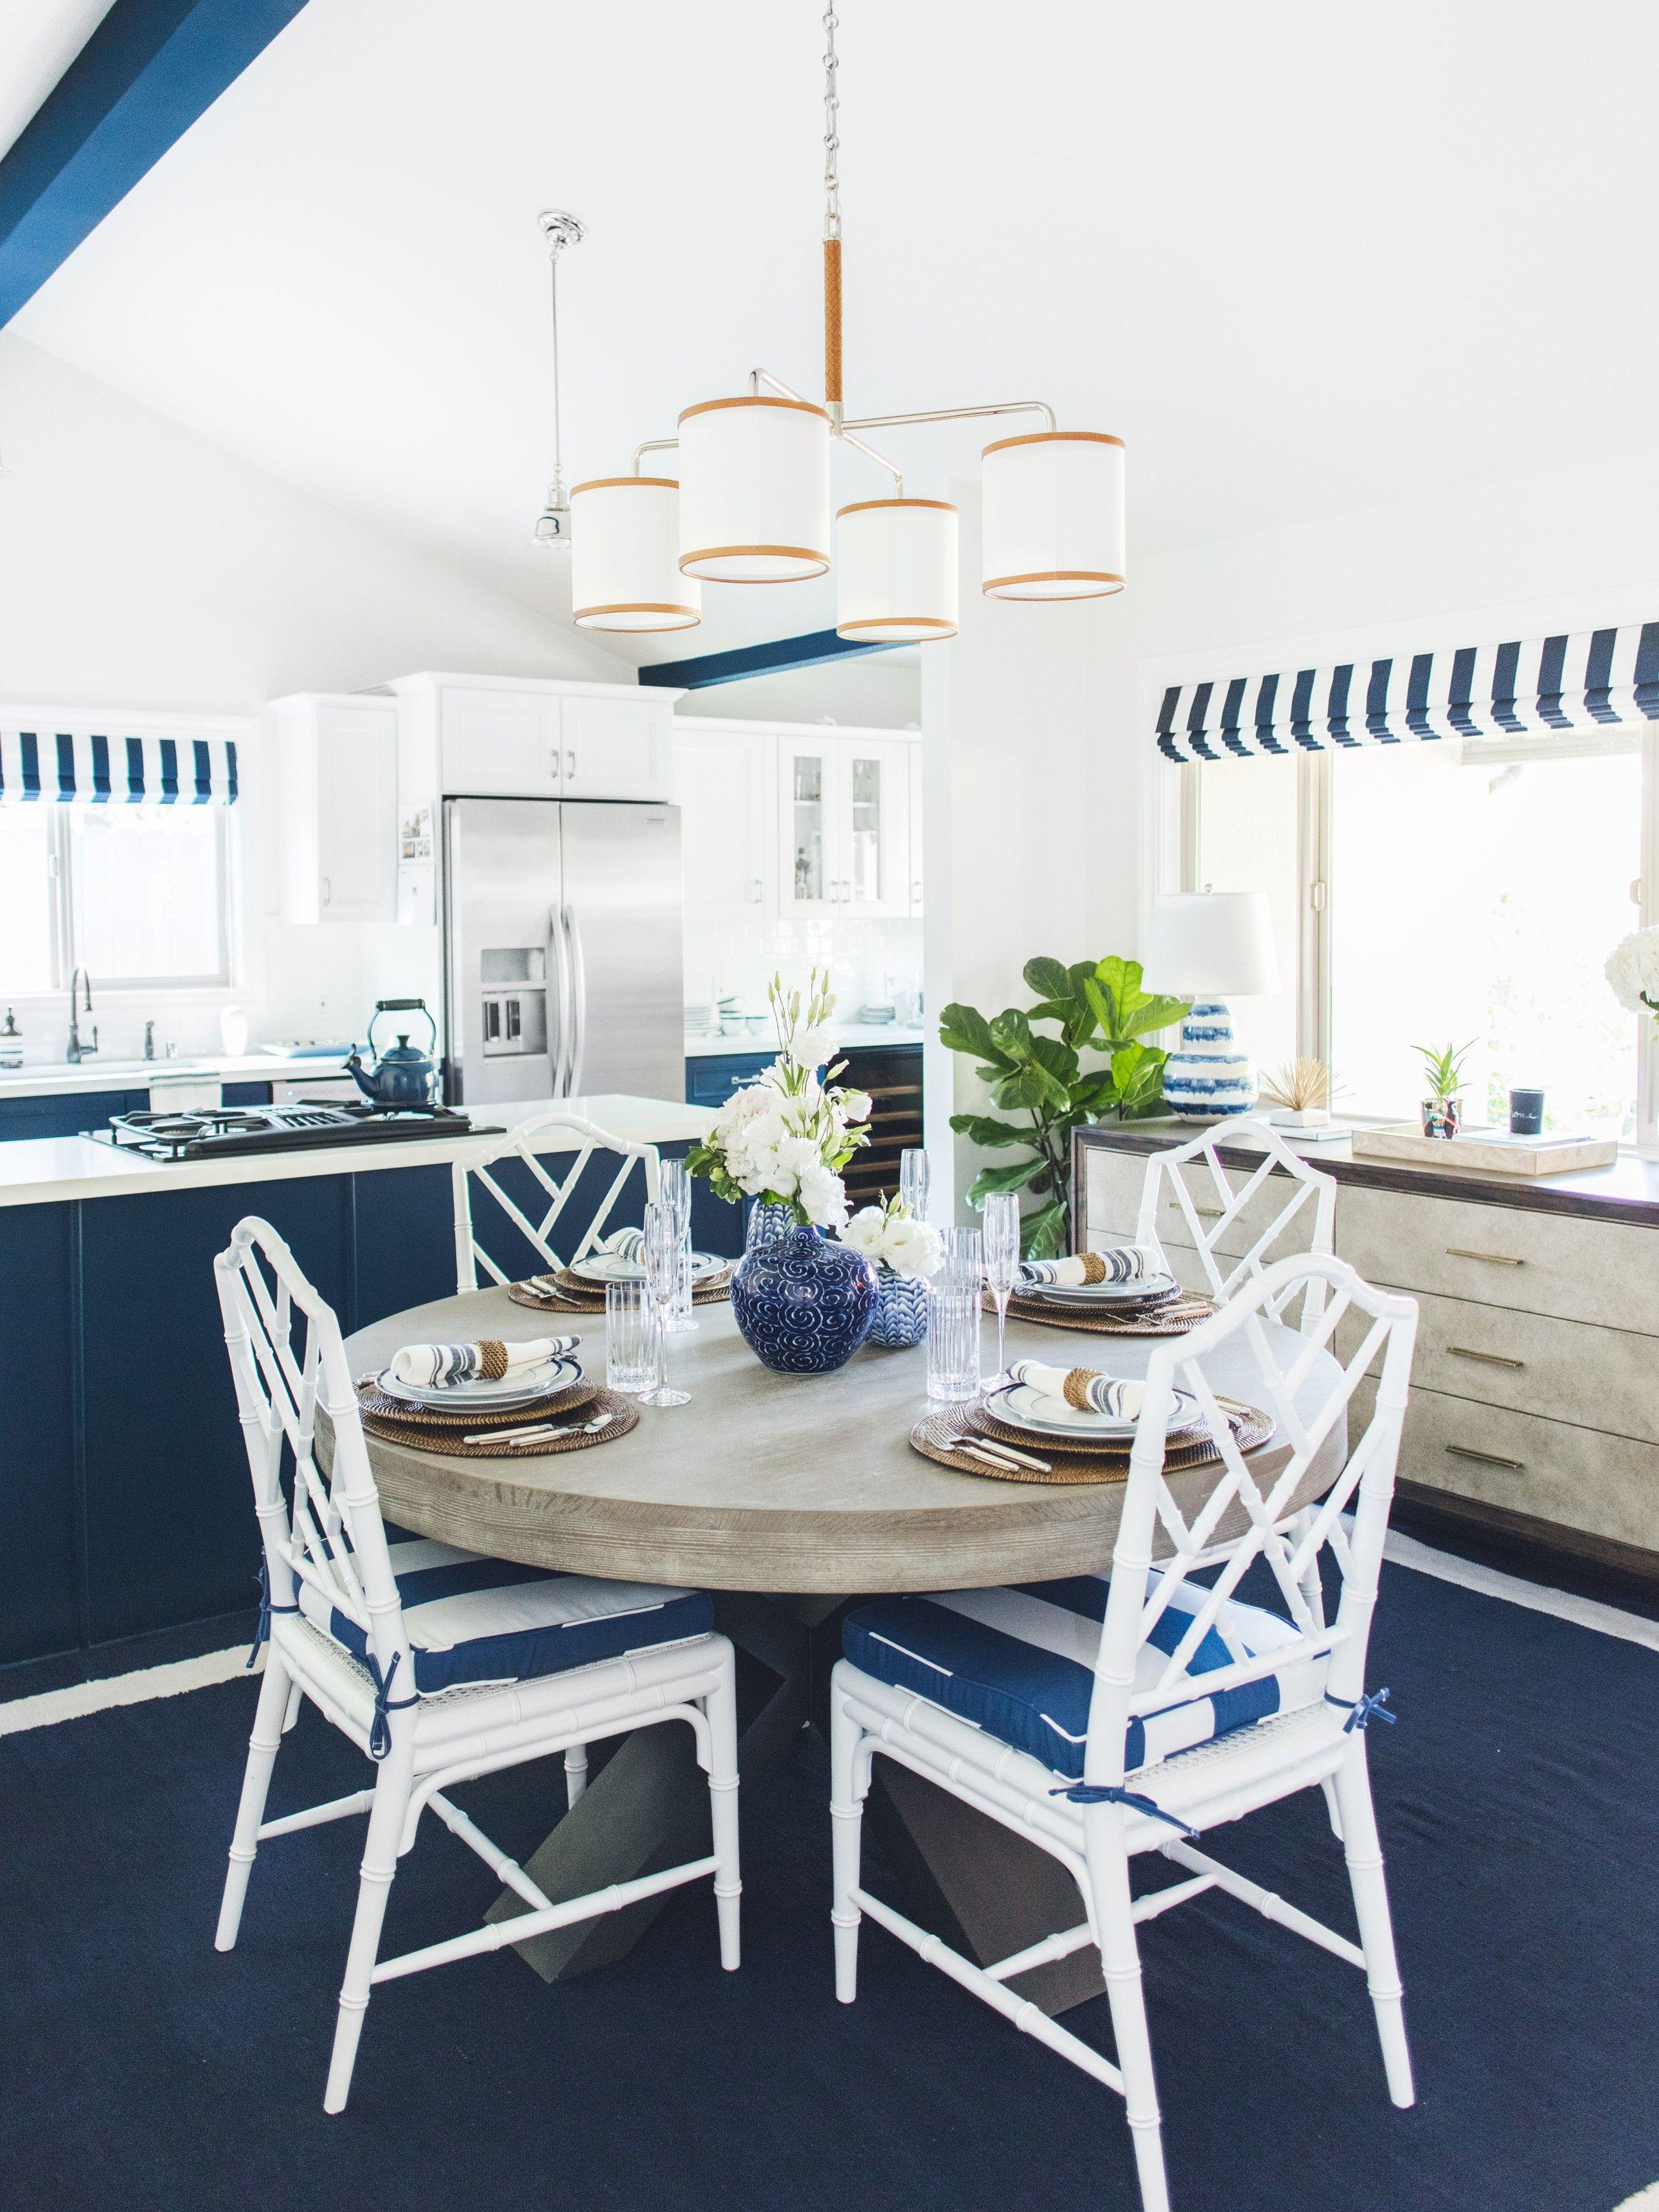 Decor & Trends   Dining room makeover, Kitchen redesign, Decor